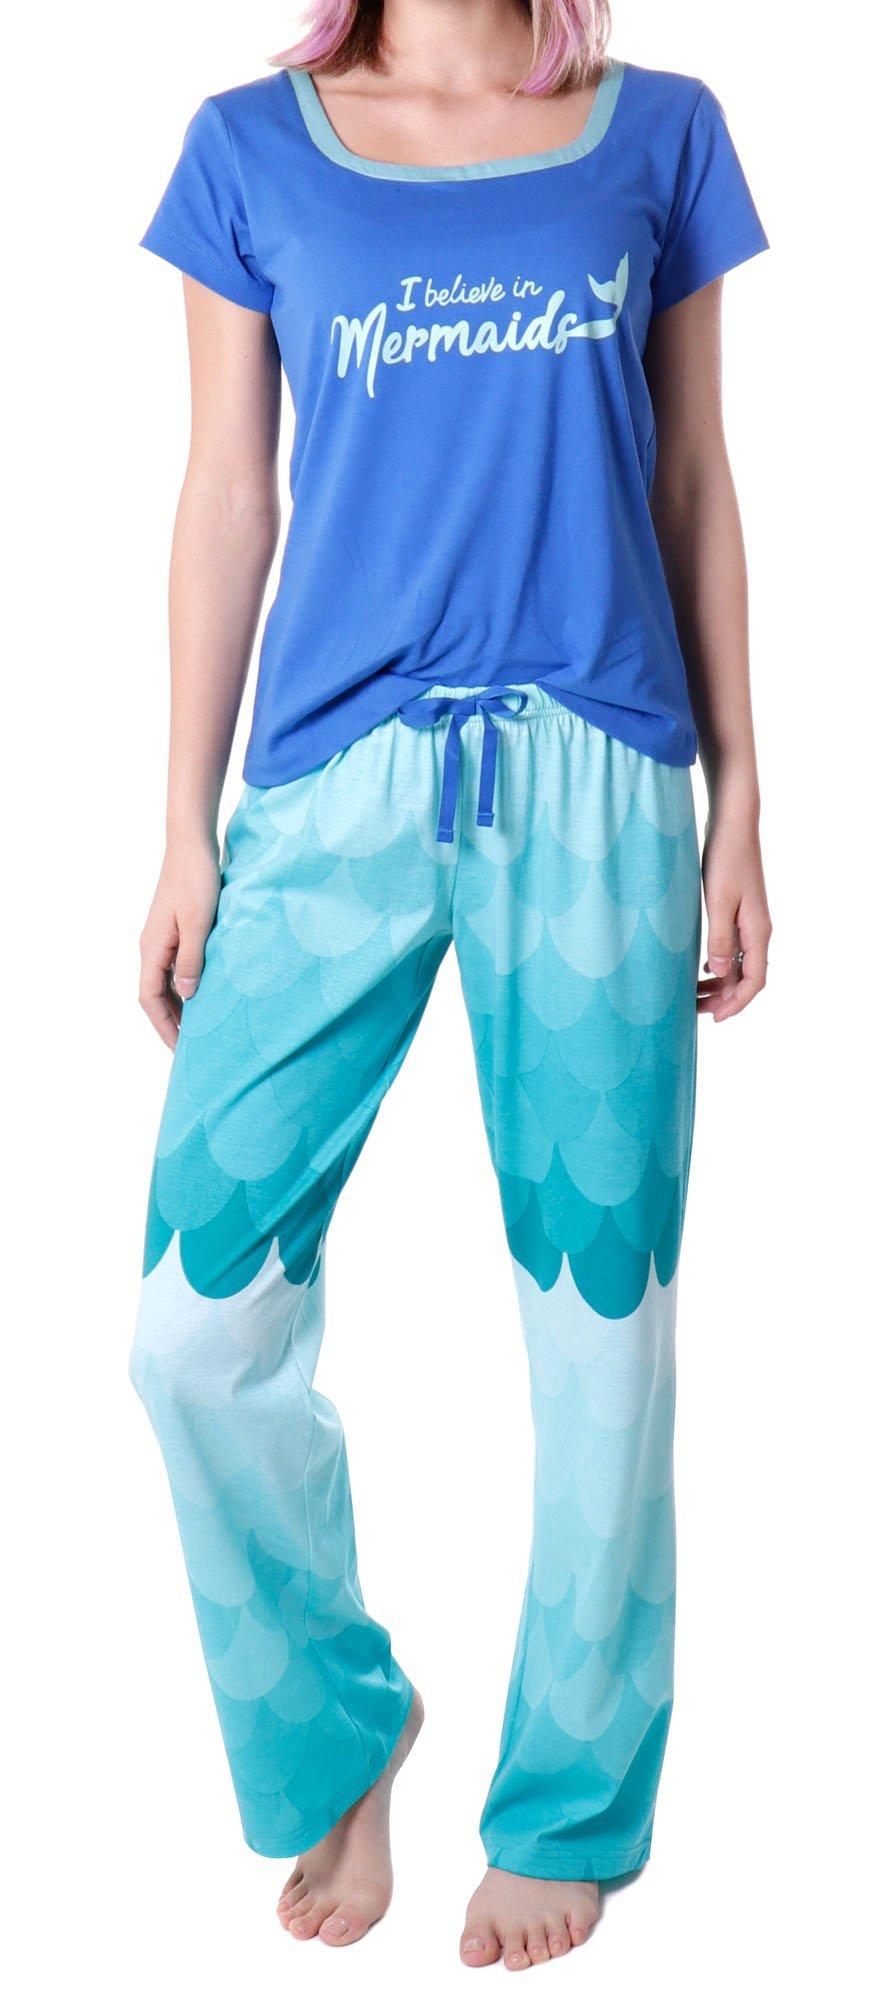 RHEA Women's Short Sleeve Shirt and Long Pajama Pants Sleepwear Set,Blue,M/Short